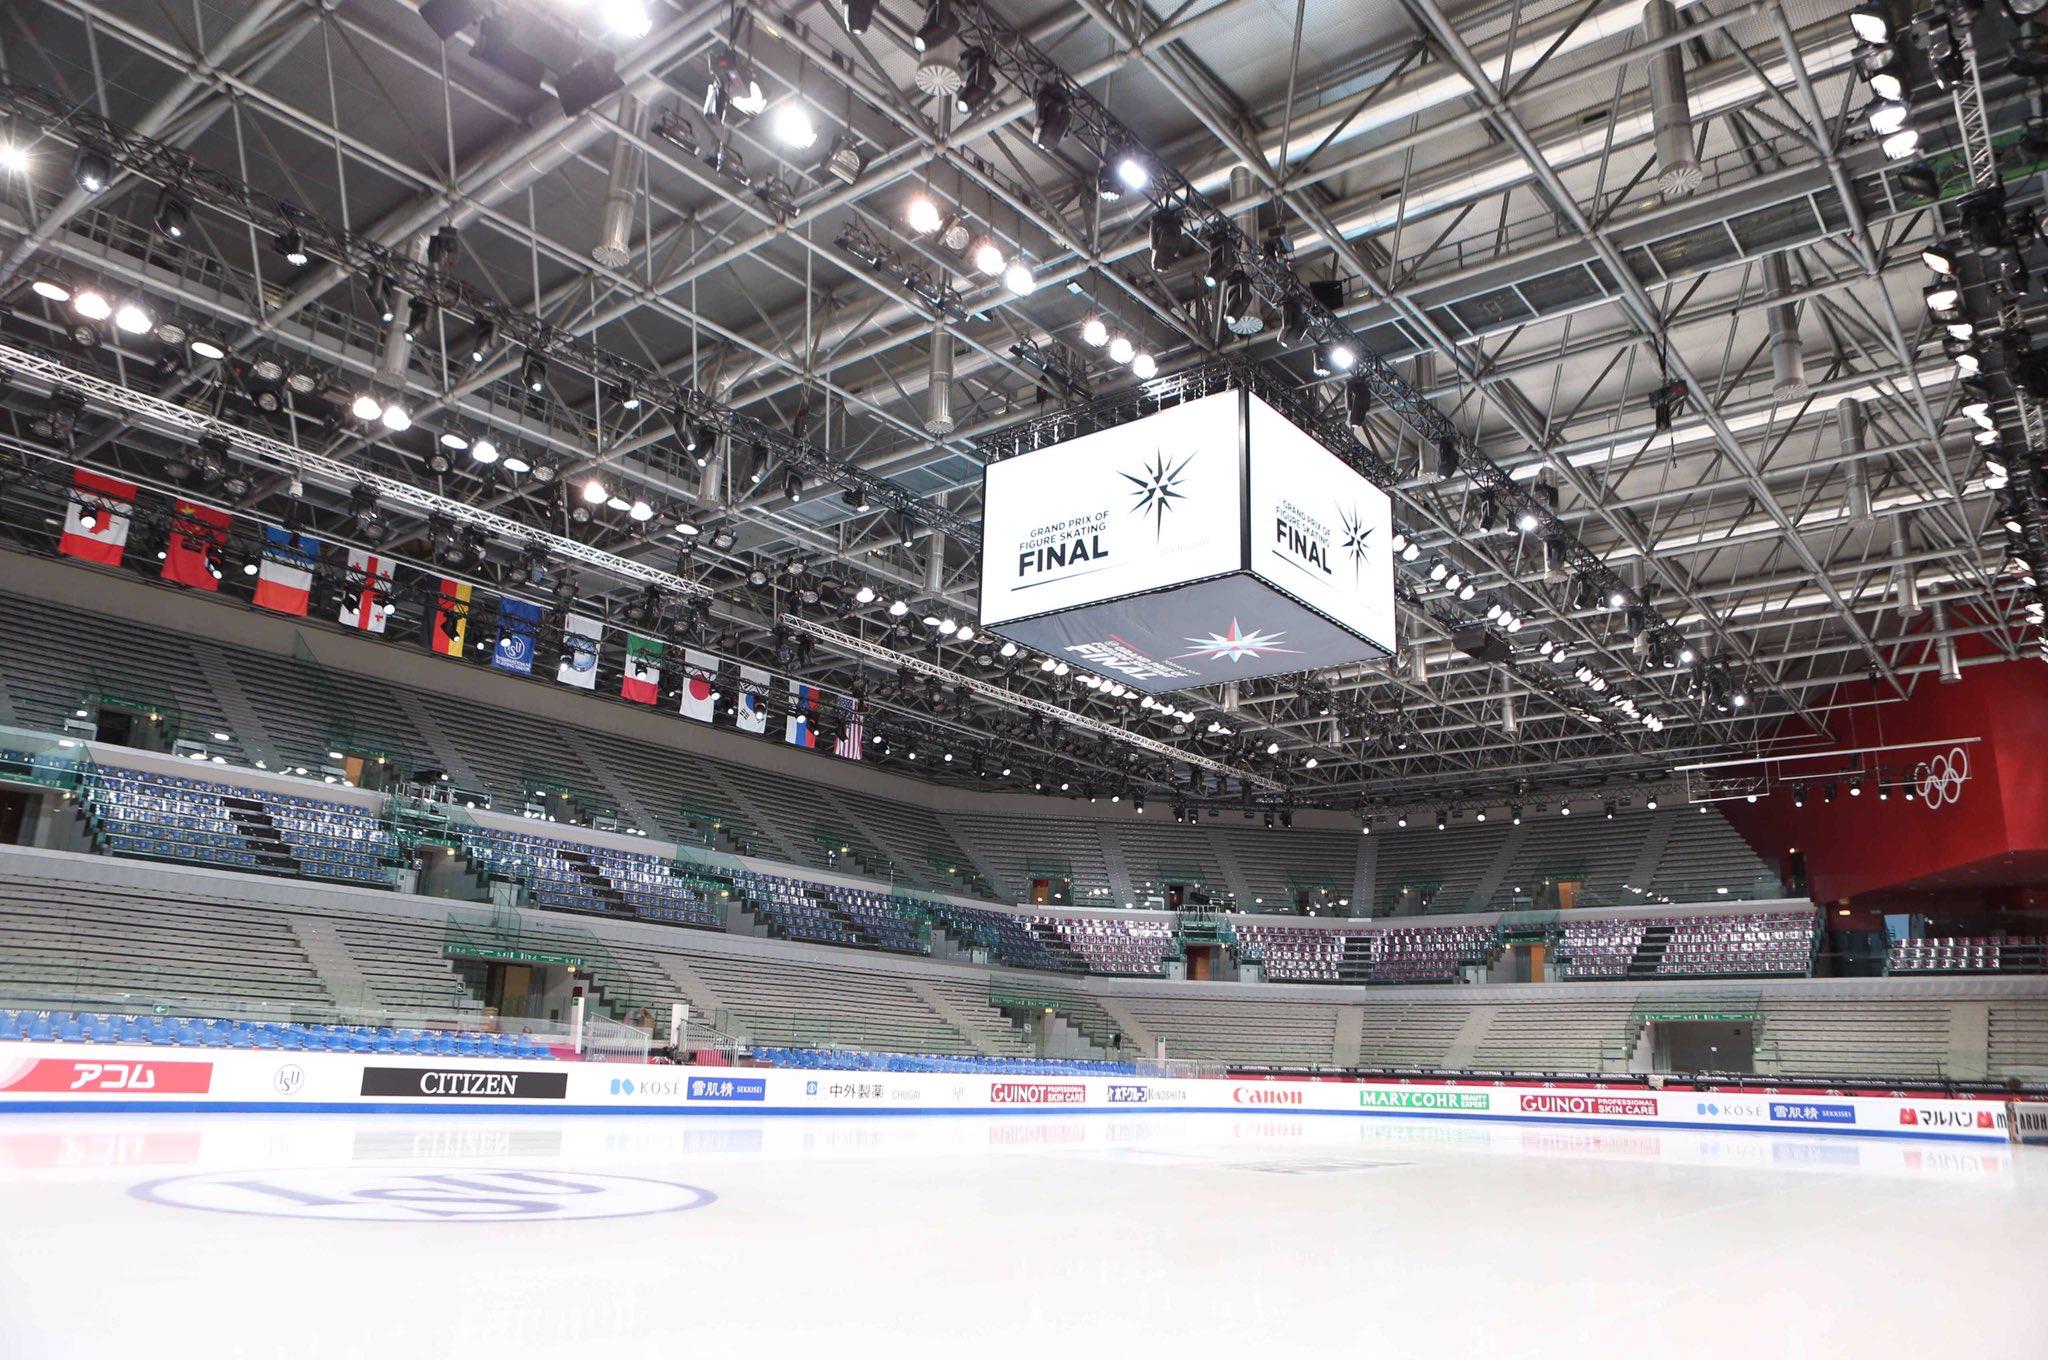 ISU Grand Prix of Figure Skating Final (Senior & Junior). Dec 05 - Dec 08, 2019.  Torino /ITA  - Страница 3 EK7MBZfWoAAgZlp?format=jpg&name=4096x4096